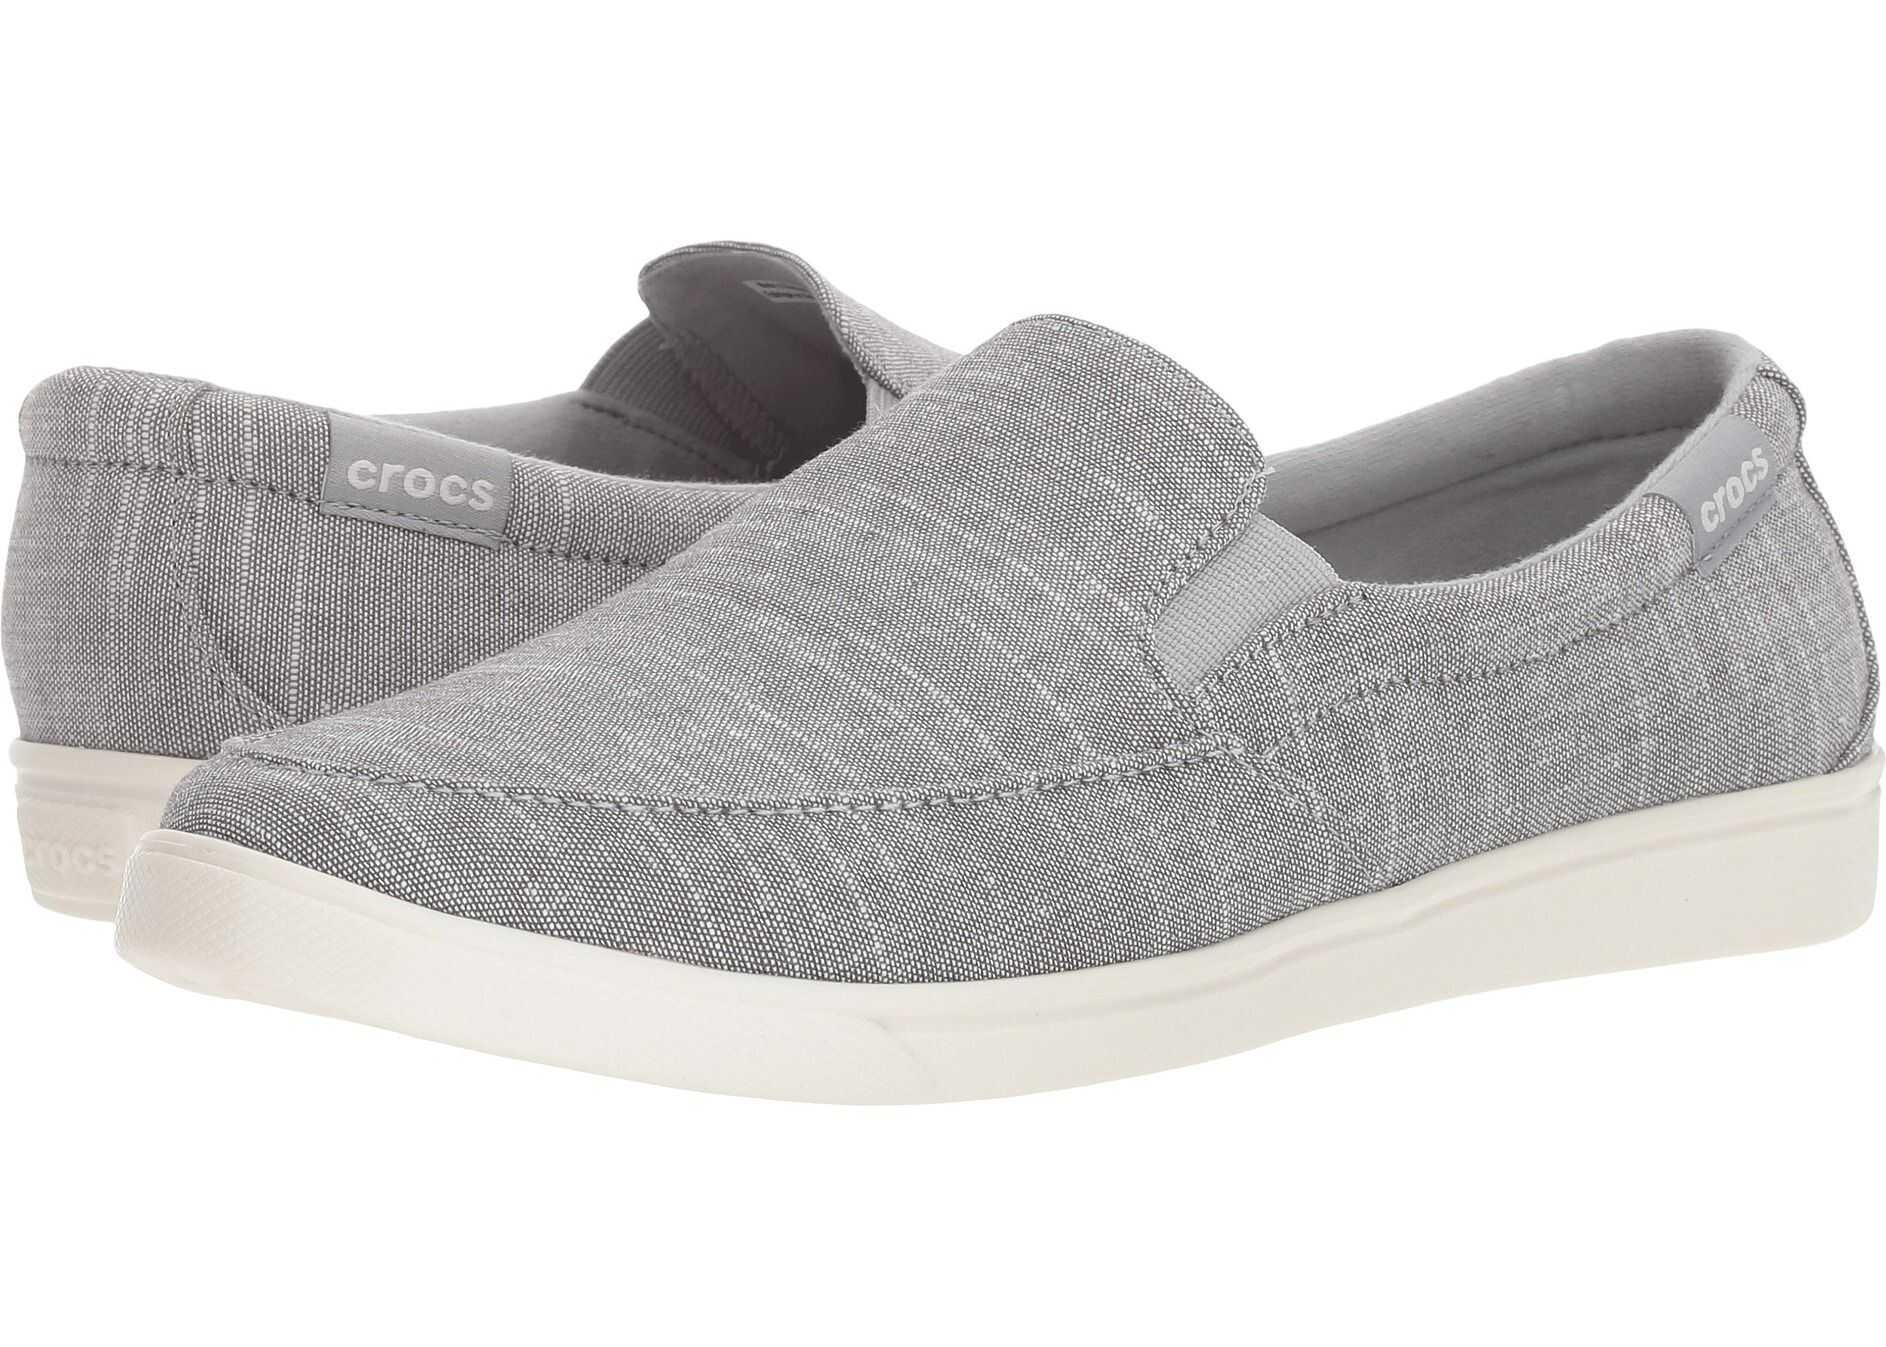 Crocs CitiLane Low Slip-On Light Grey